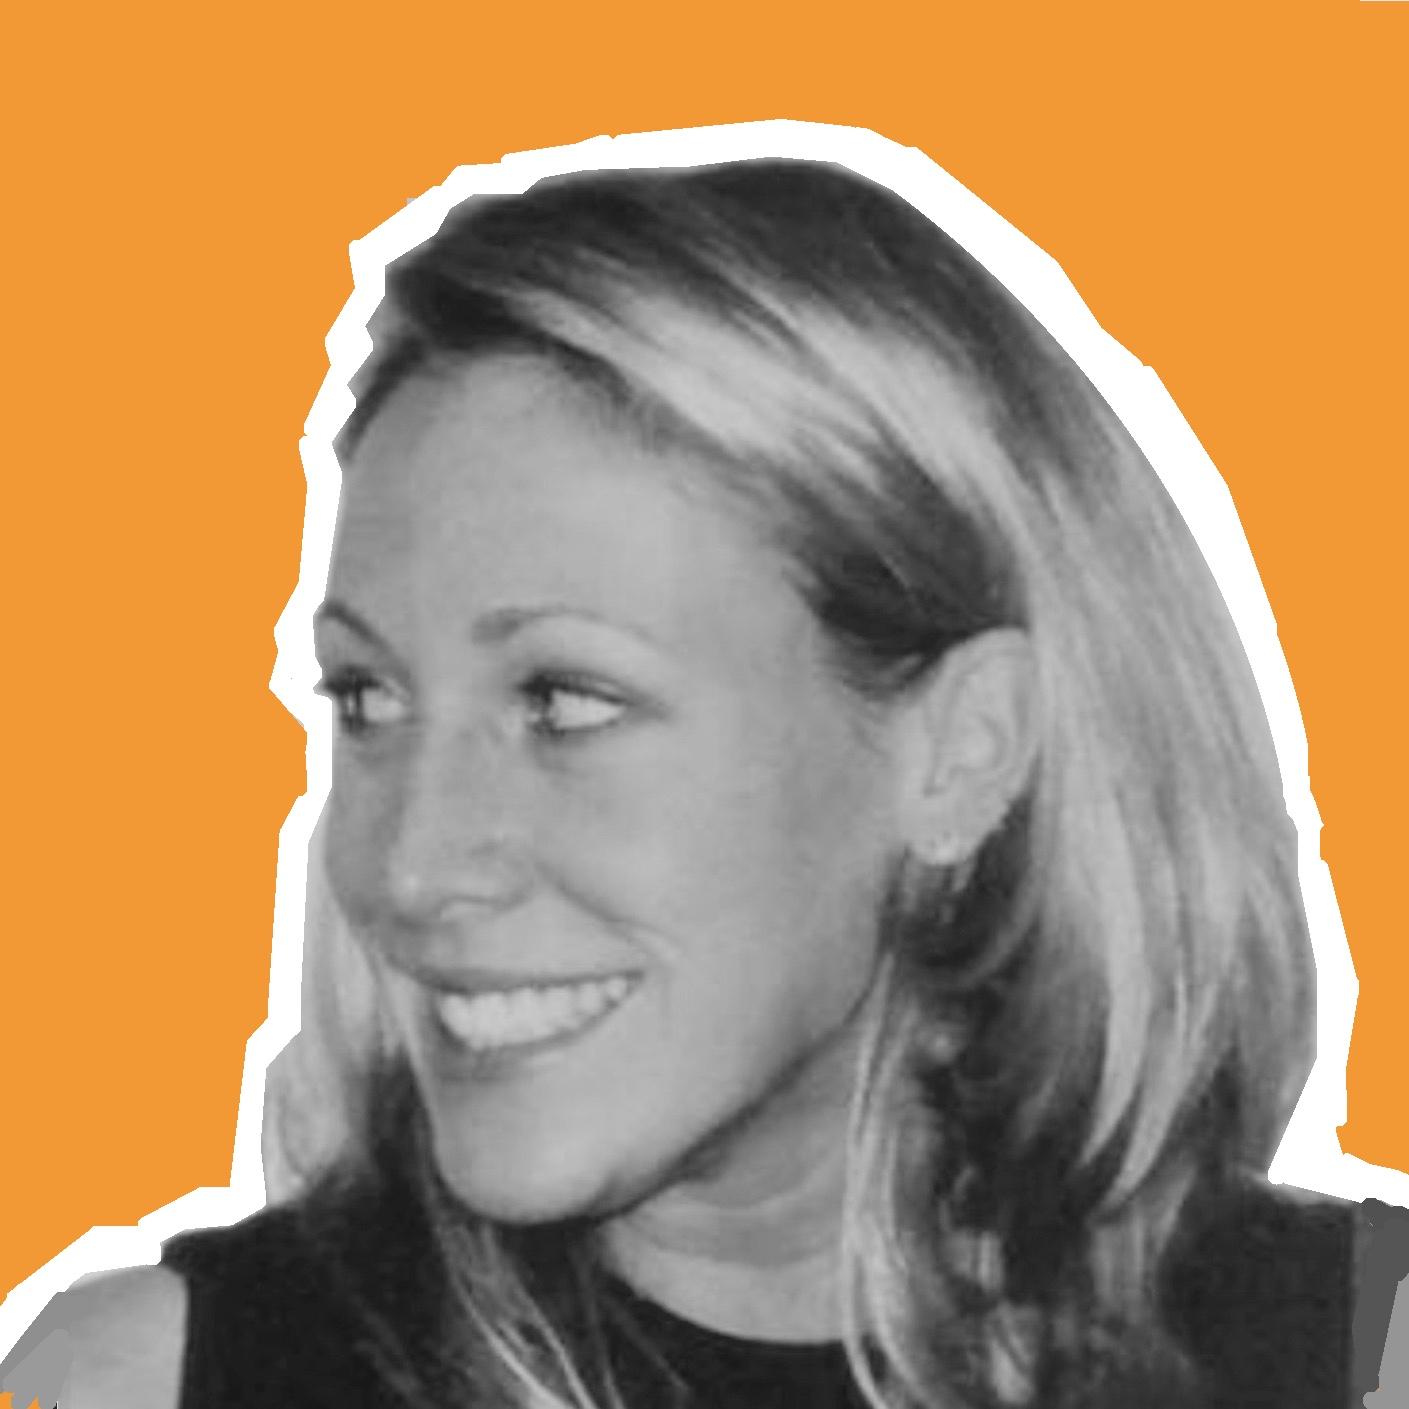 Jennifer Newman-Galuzzo   Public Relations  Education:  Lehigh University- BA  Pace University- MST